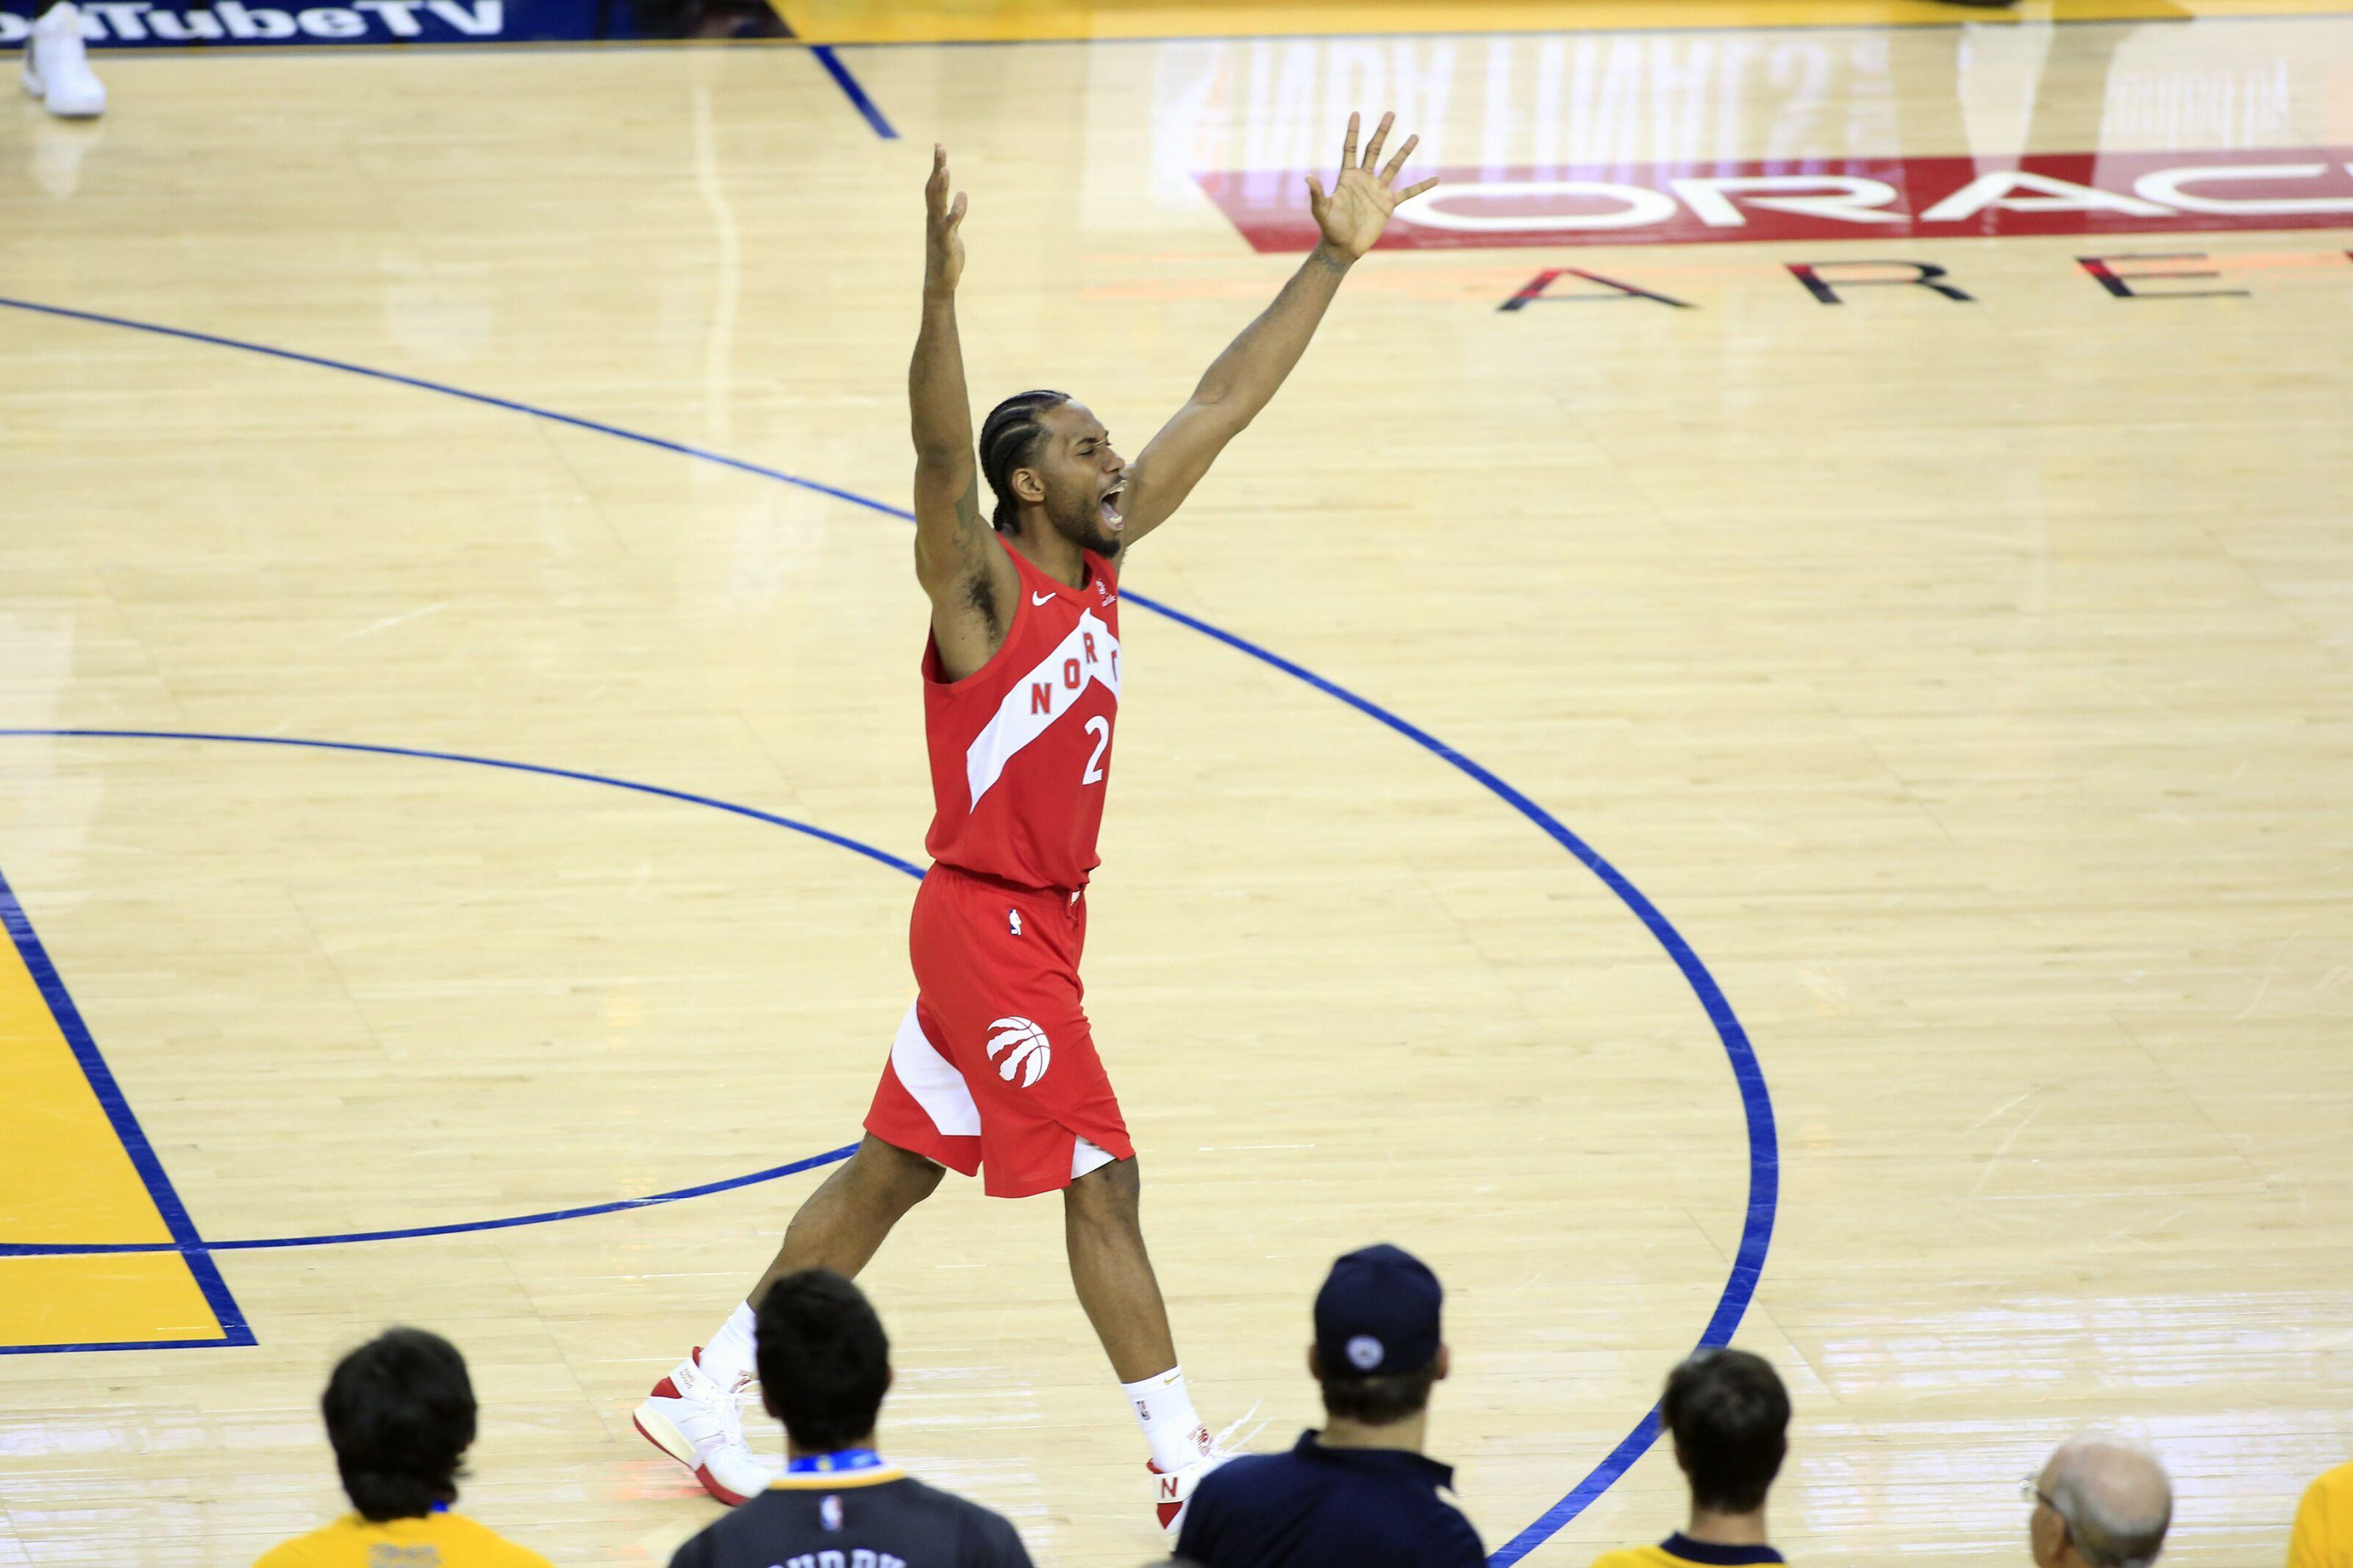 Why Toronto Raptors 17-5 record without Kawhi Leonard is misleading